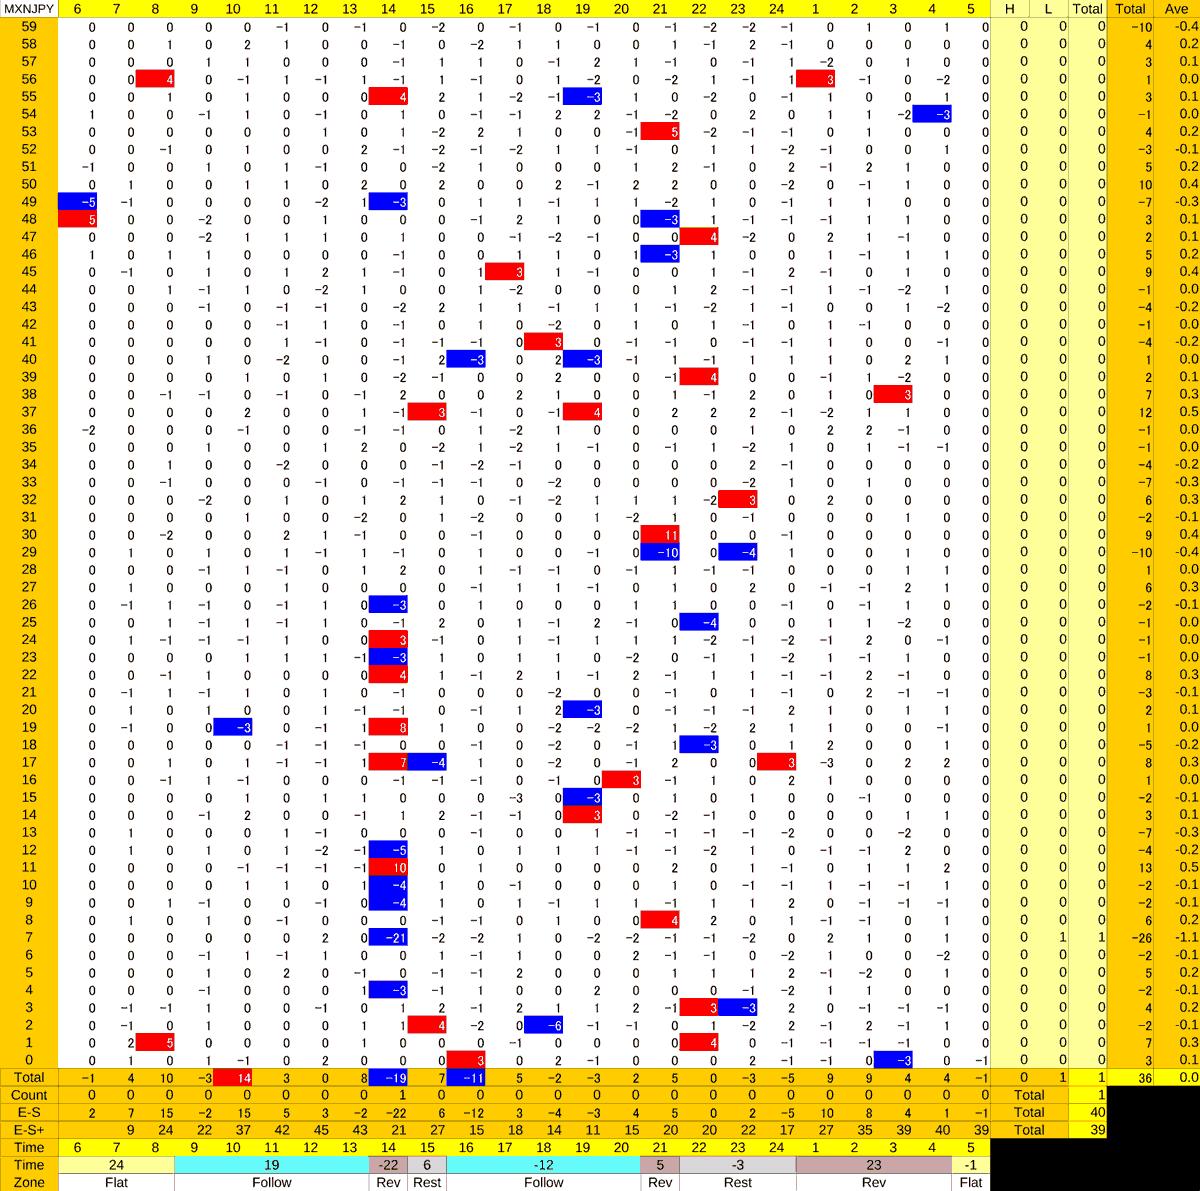 20200828_HS(3)MXNJPY